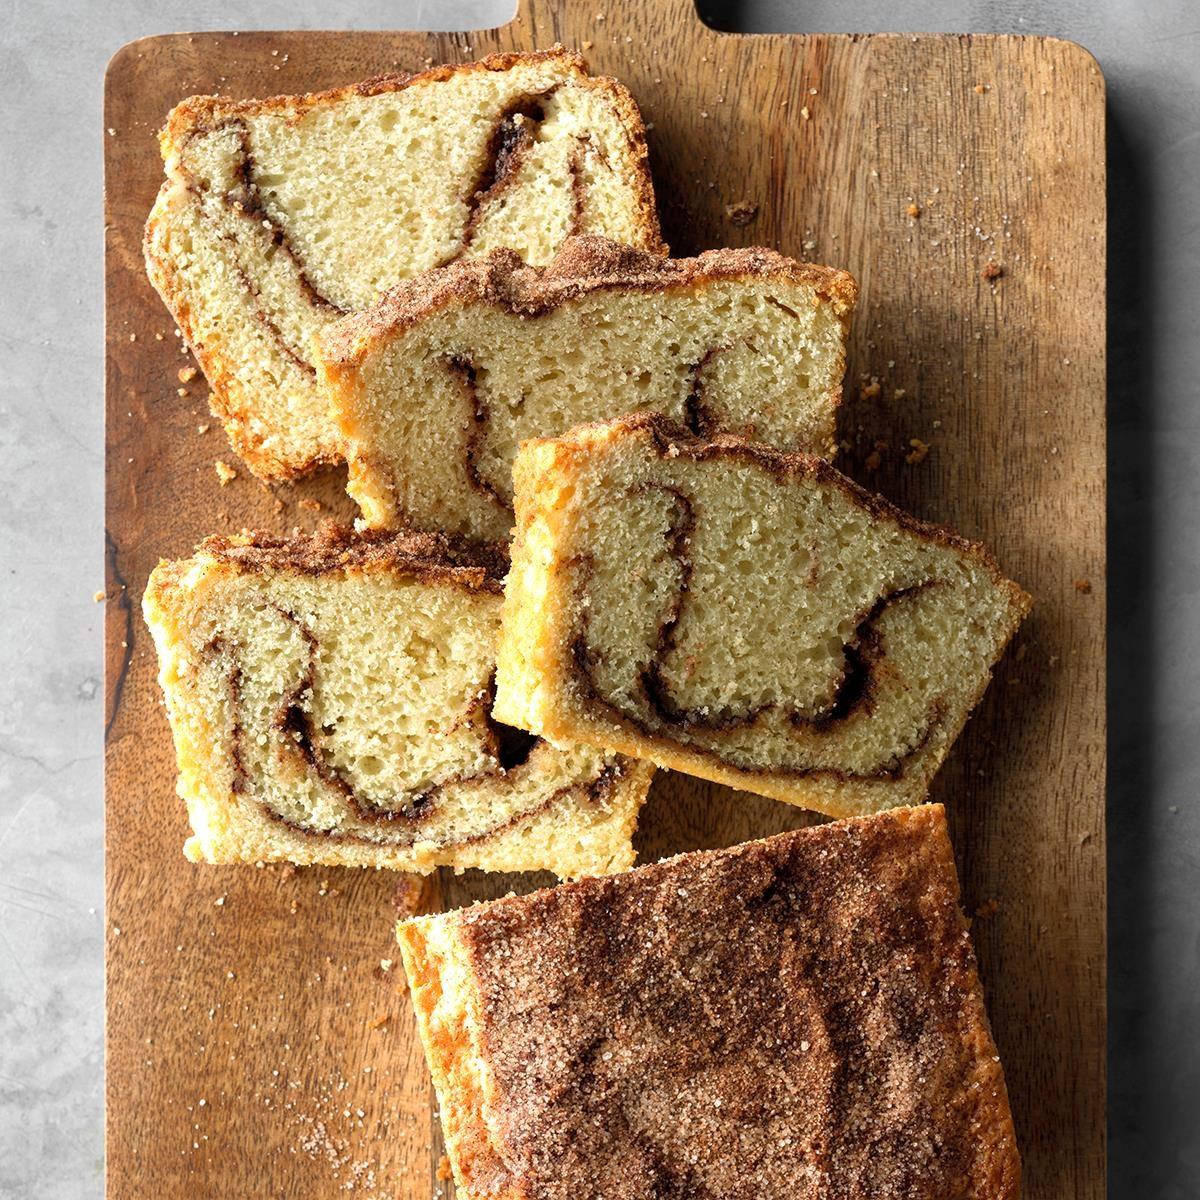 Country Cinnamon Swirl Bread Exps Sdas18 23049 C04 03  2b 8